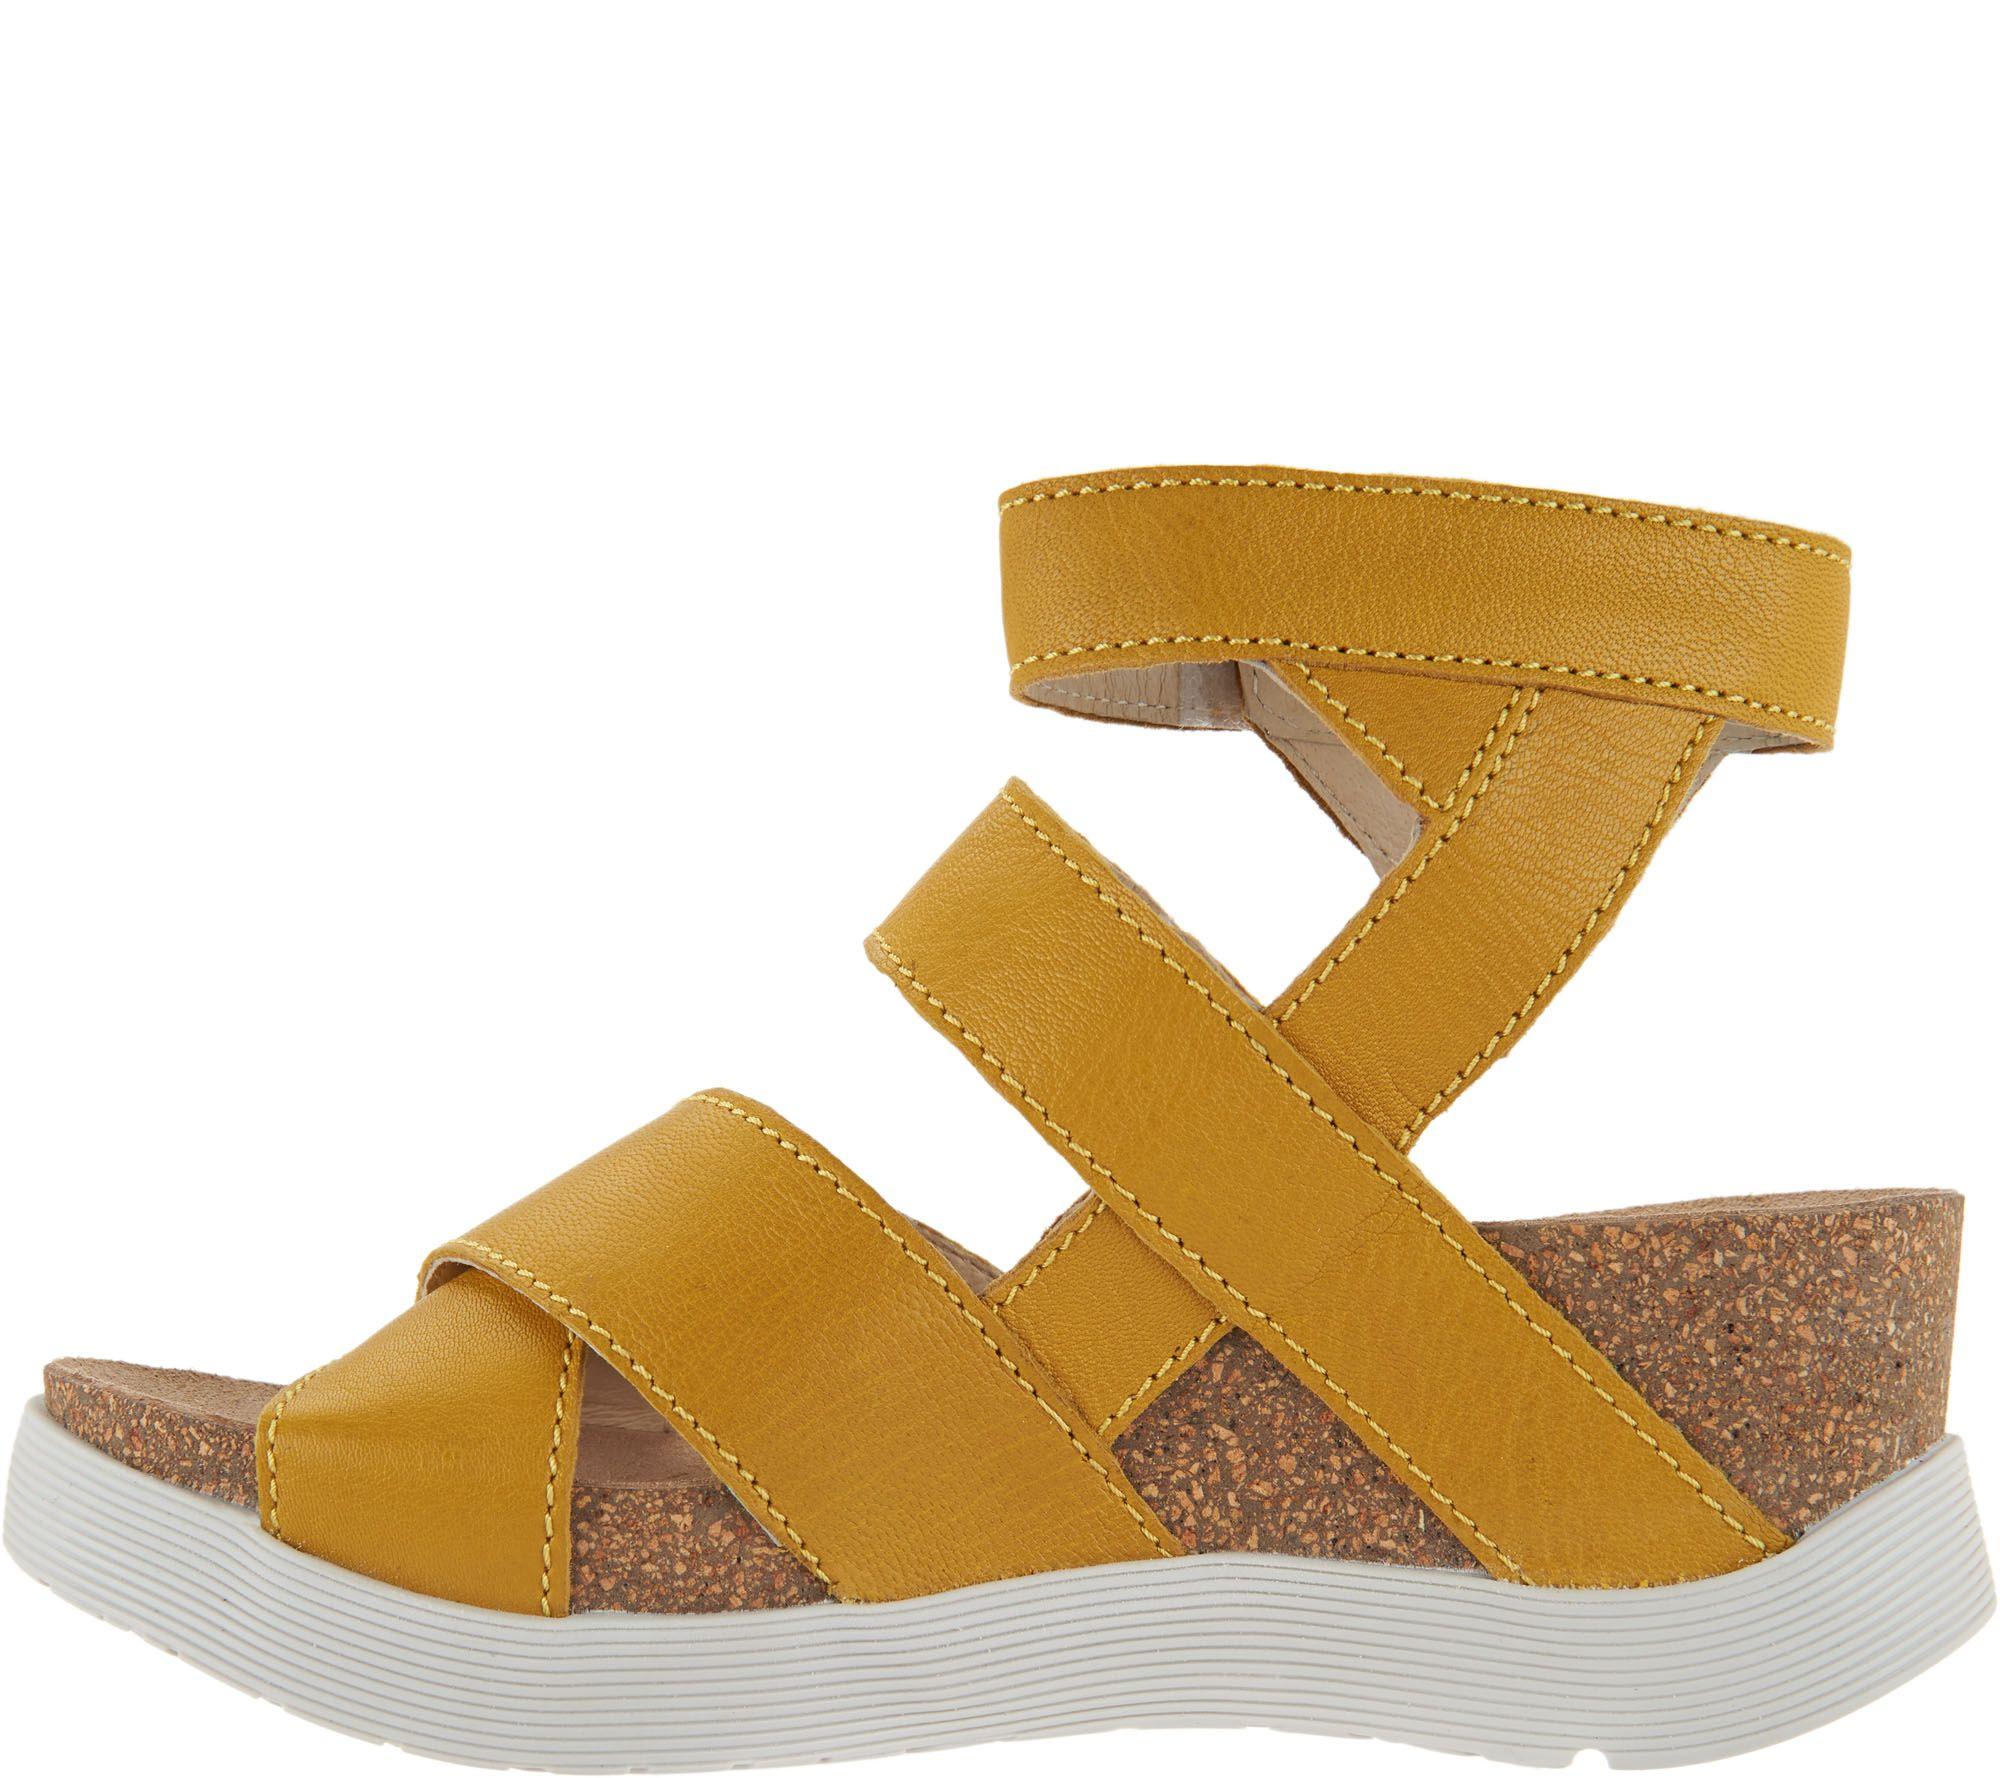 4de21a02ebd1 FLY London Leather Strappy Sandals - Wege - Page 1 — QVC.com